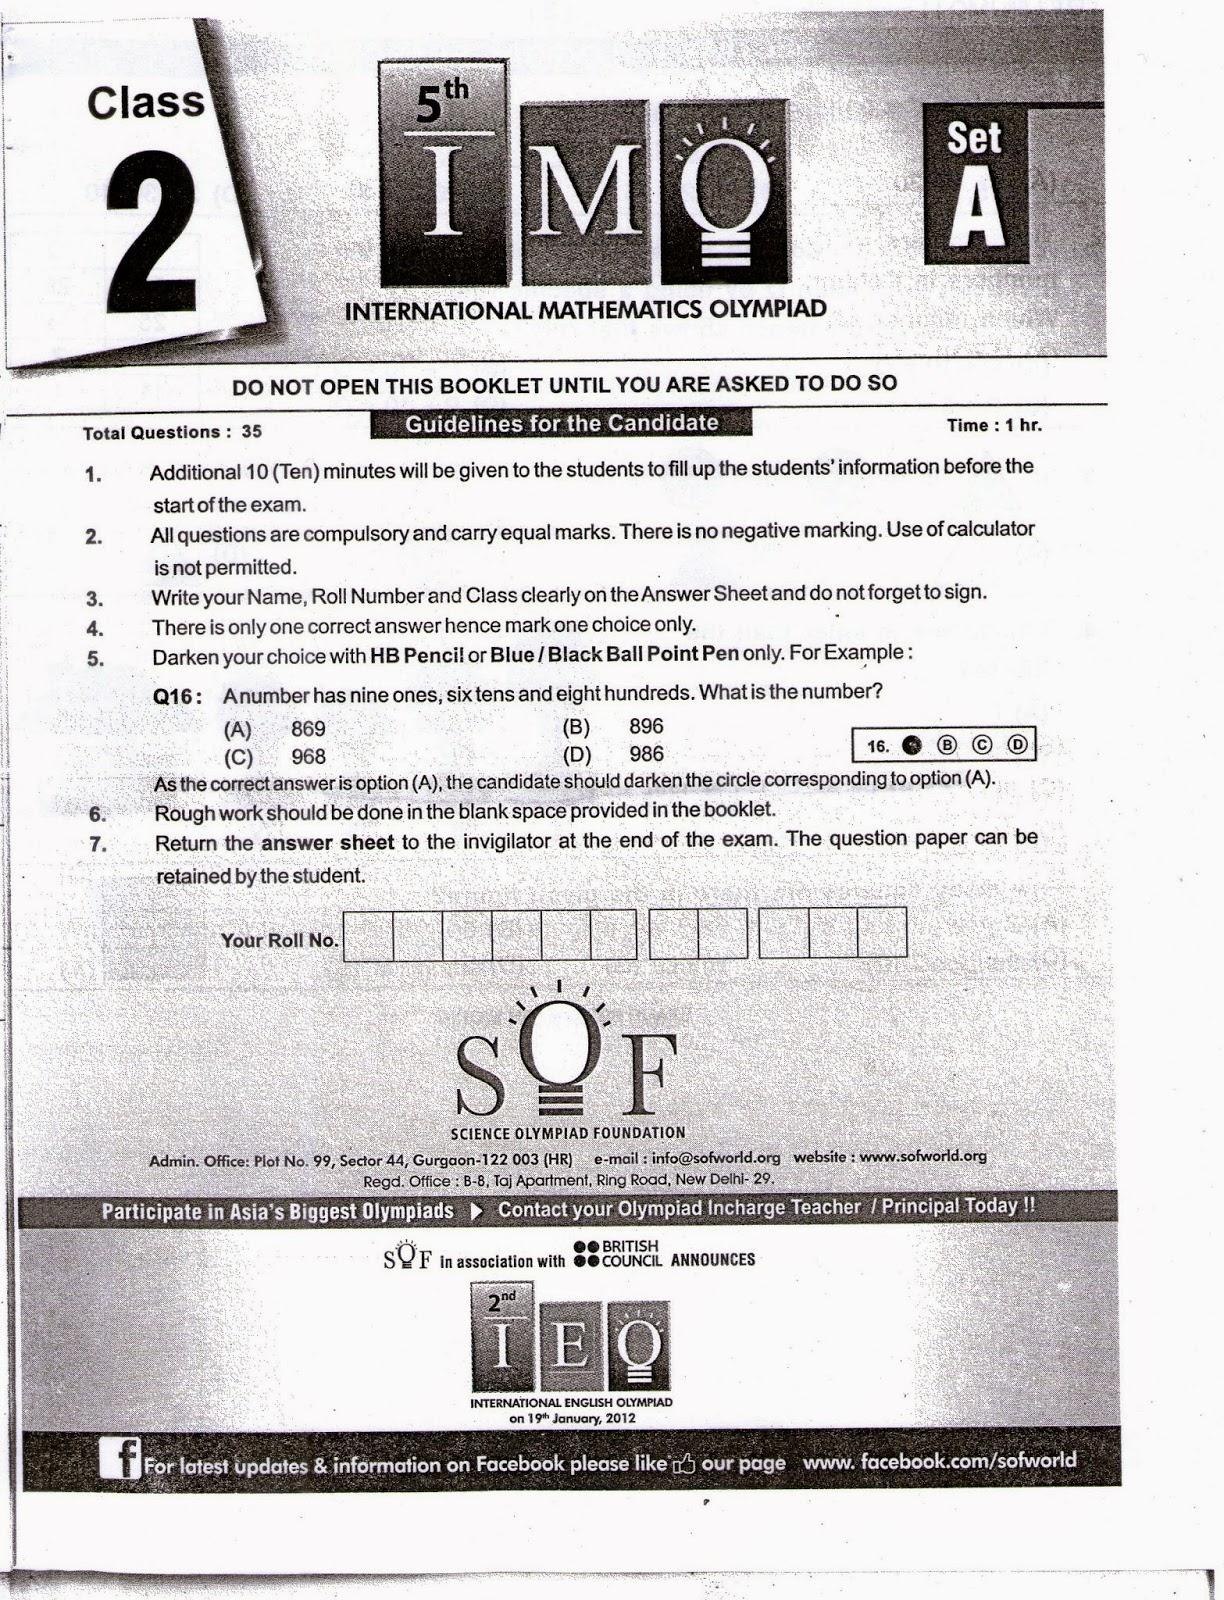 Preparations for IPM, MTSE, Olympiad, MAT, Scholarship,CBSE